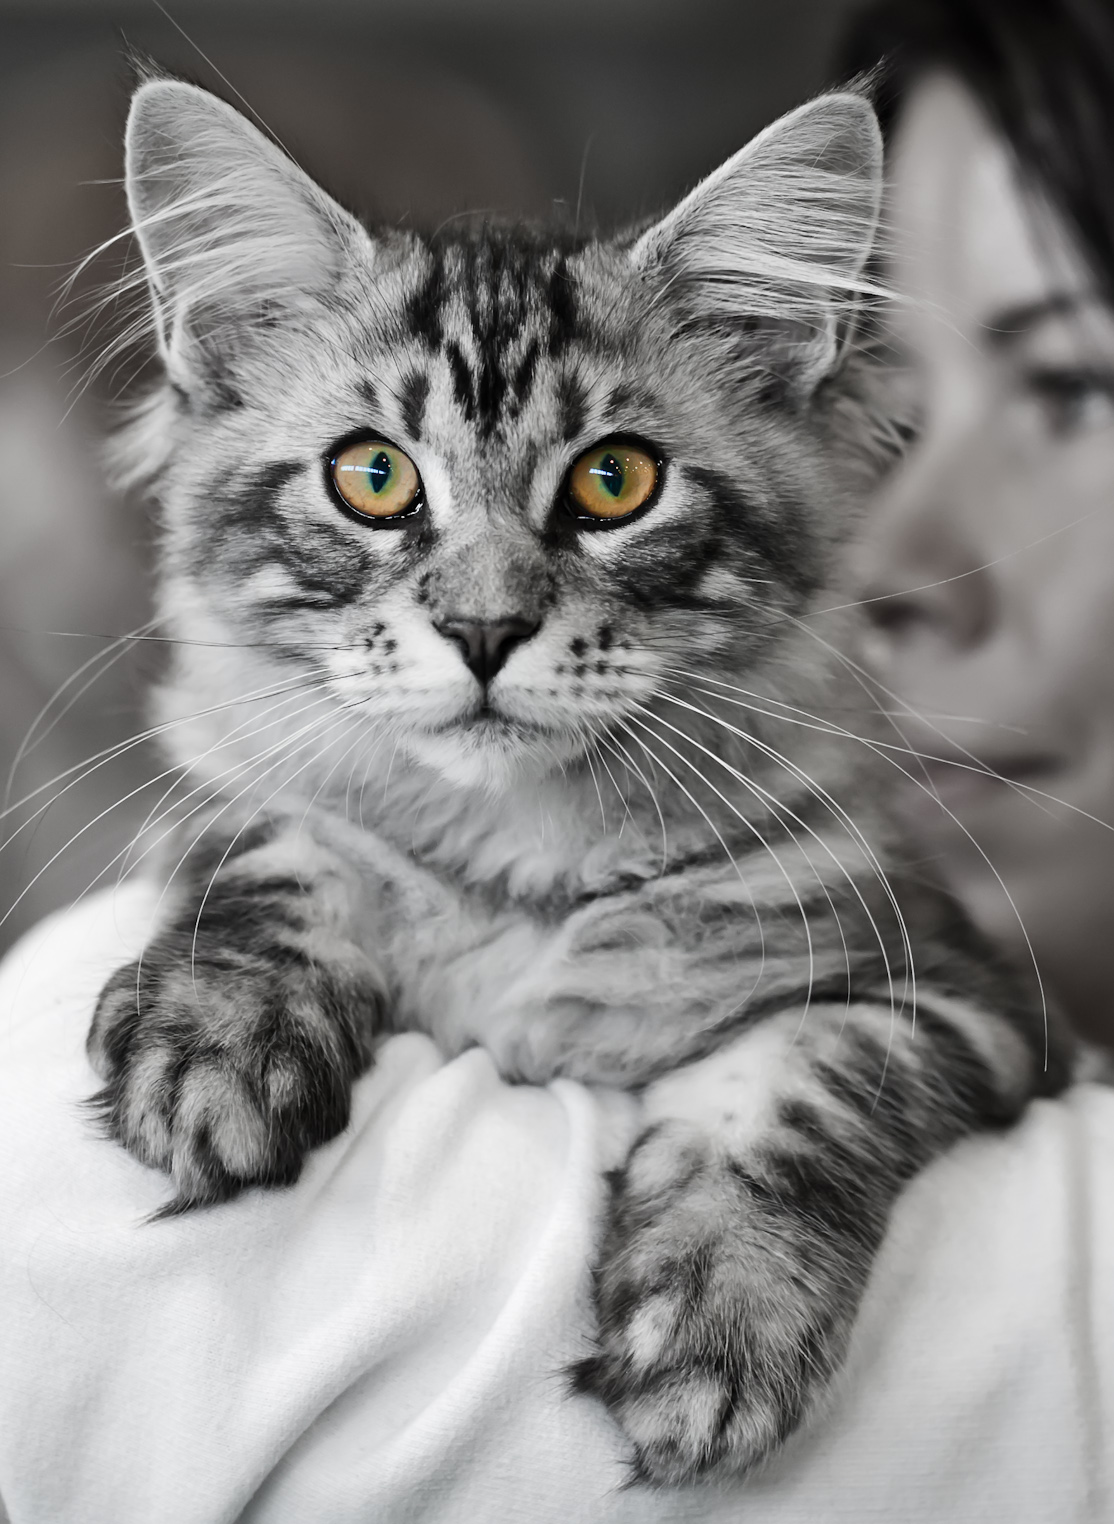 Satinante's Edward Cullen (Eetu) [MCO ns 22], photo 189036, 2012-03-03